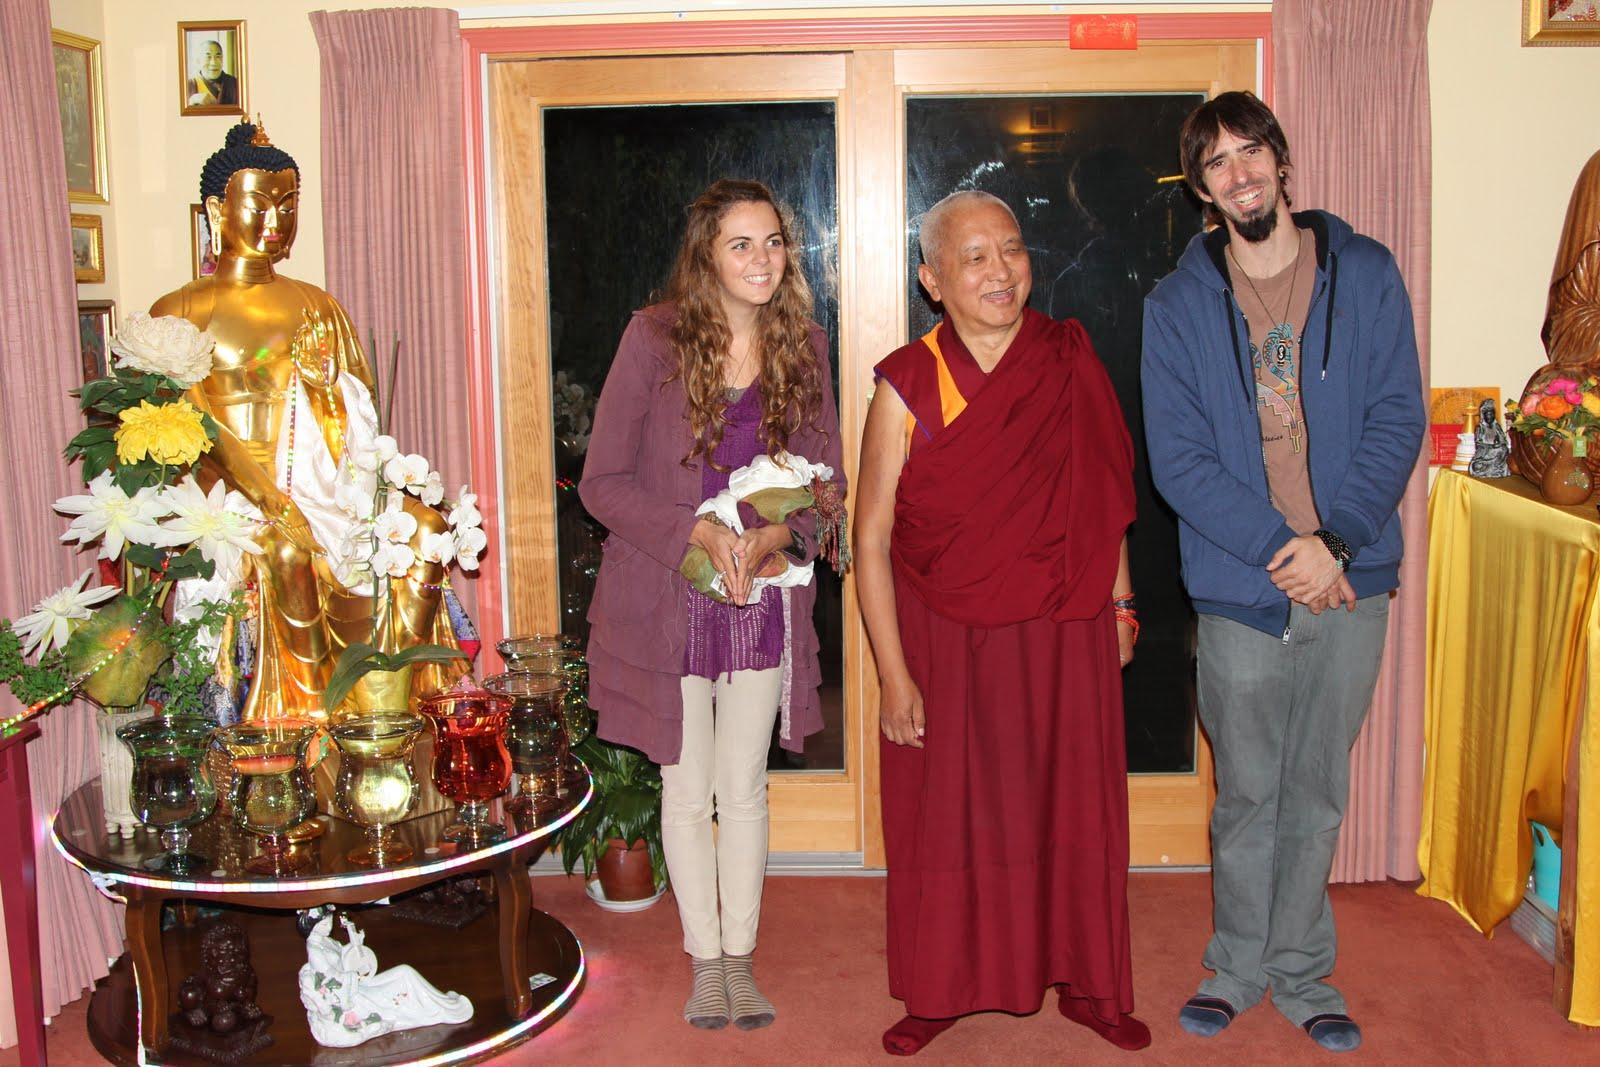 Tenzin Ösel and his partner, Mai, visiting Rinpoche at Aptos House, California. October, 2013.